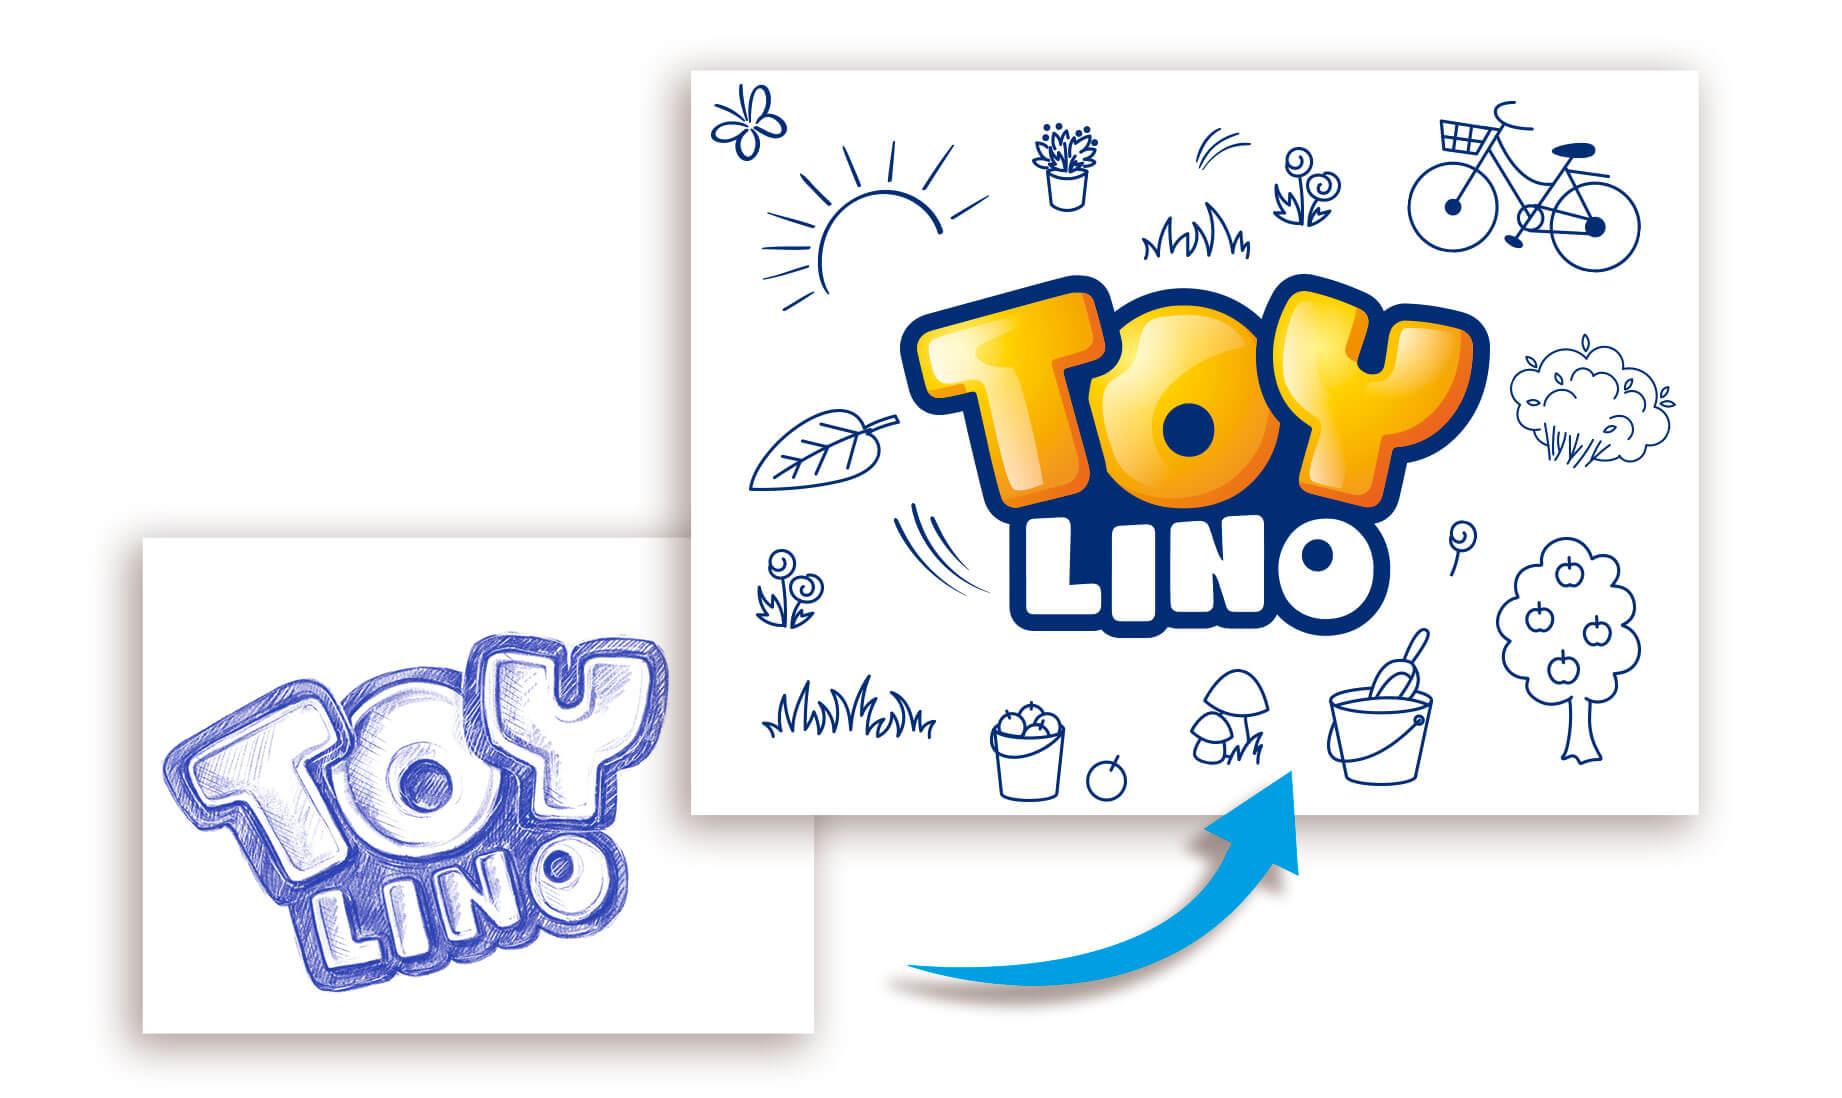 hofer toylino spielzeug logo corporate design